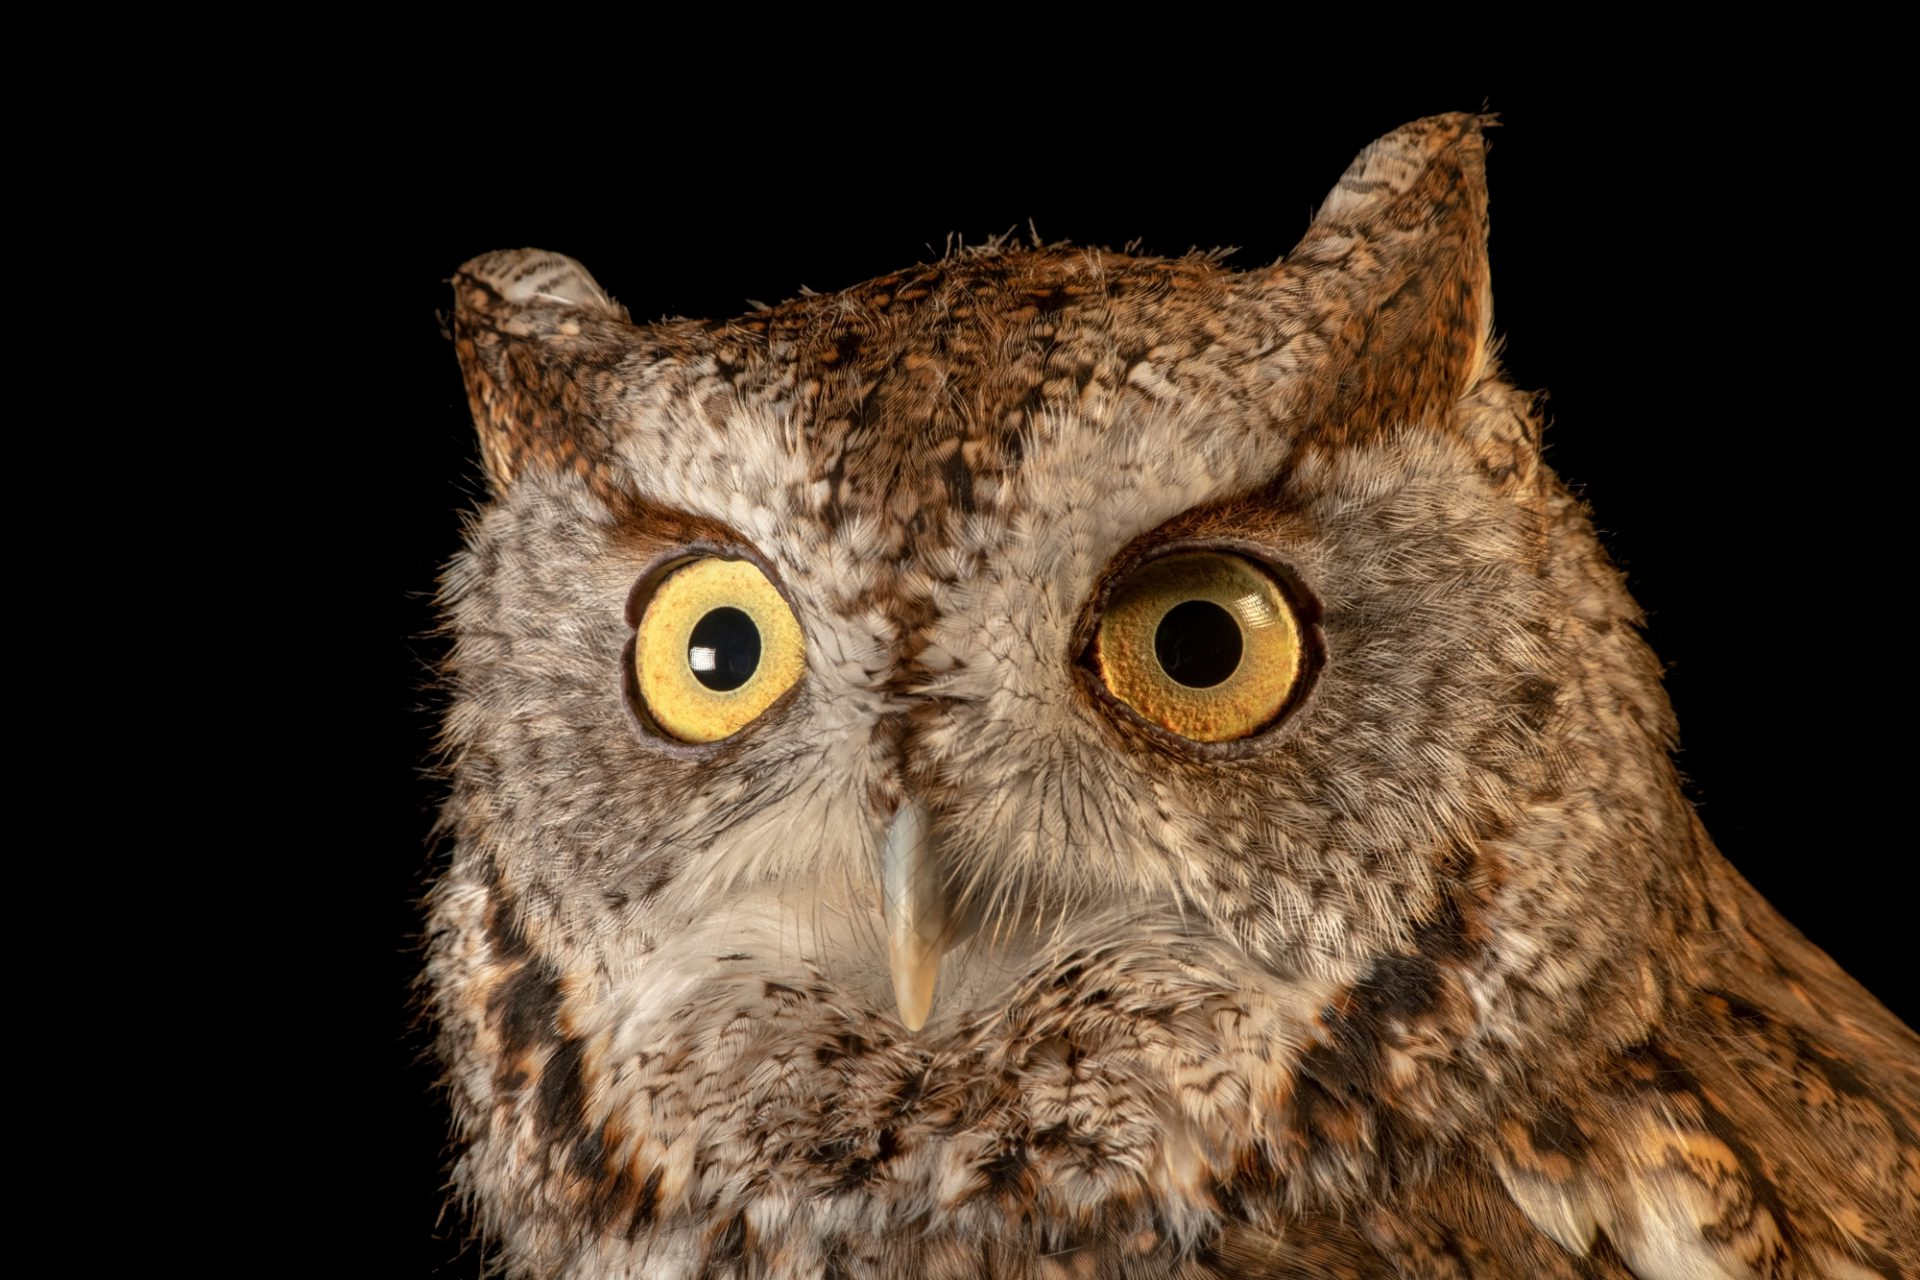 Photo: Eastern screech owl (Megascops asio asio) at the Nashville Zoo.